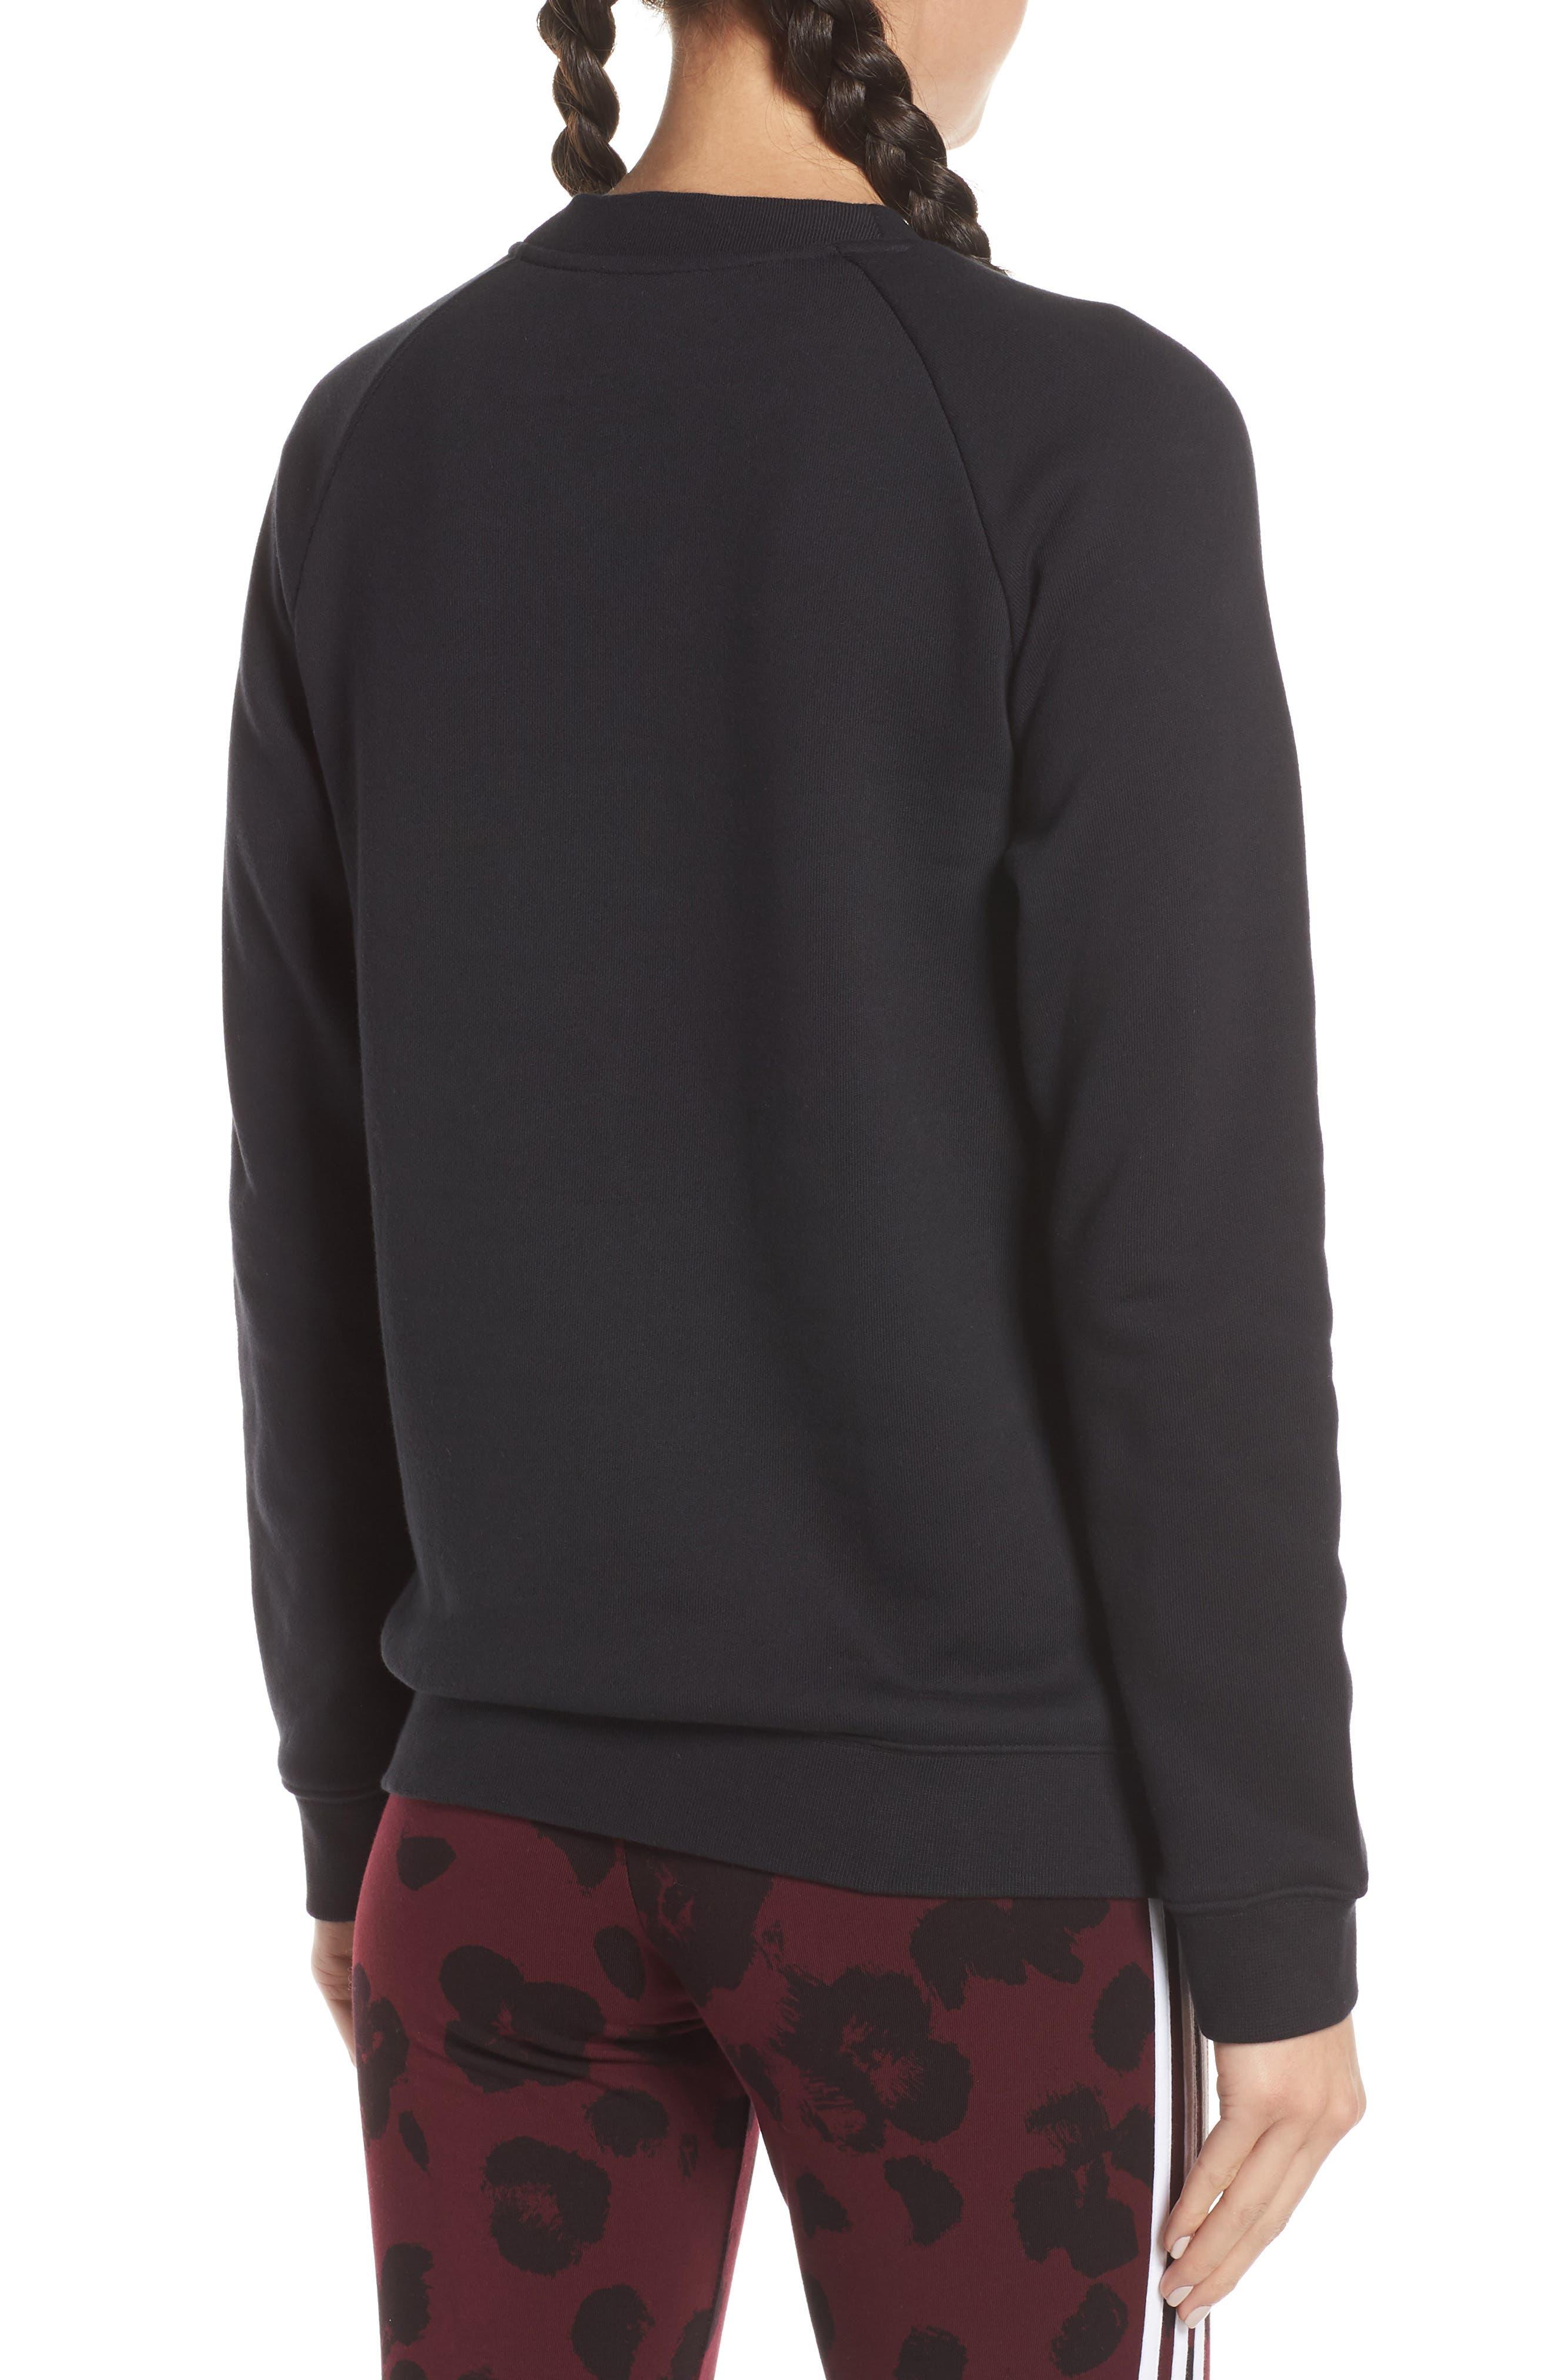 ADIDAS ORIGINALS, Trefoil Sweatshirt, Alternate thumbnail 2, color, 001